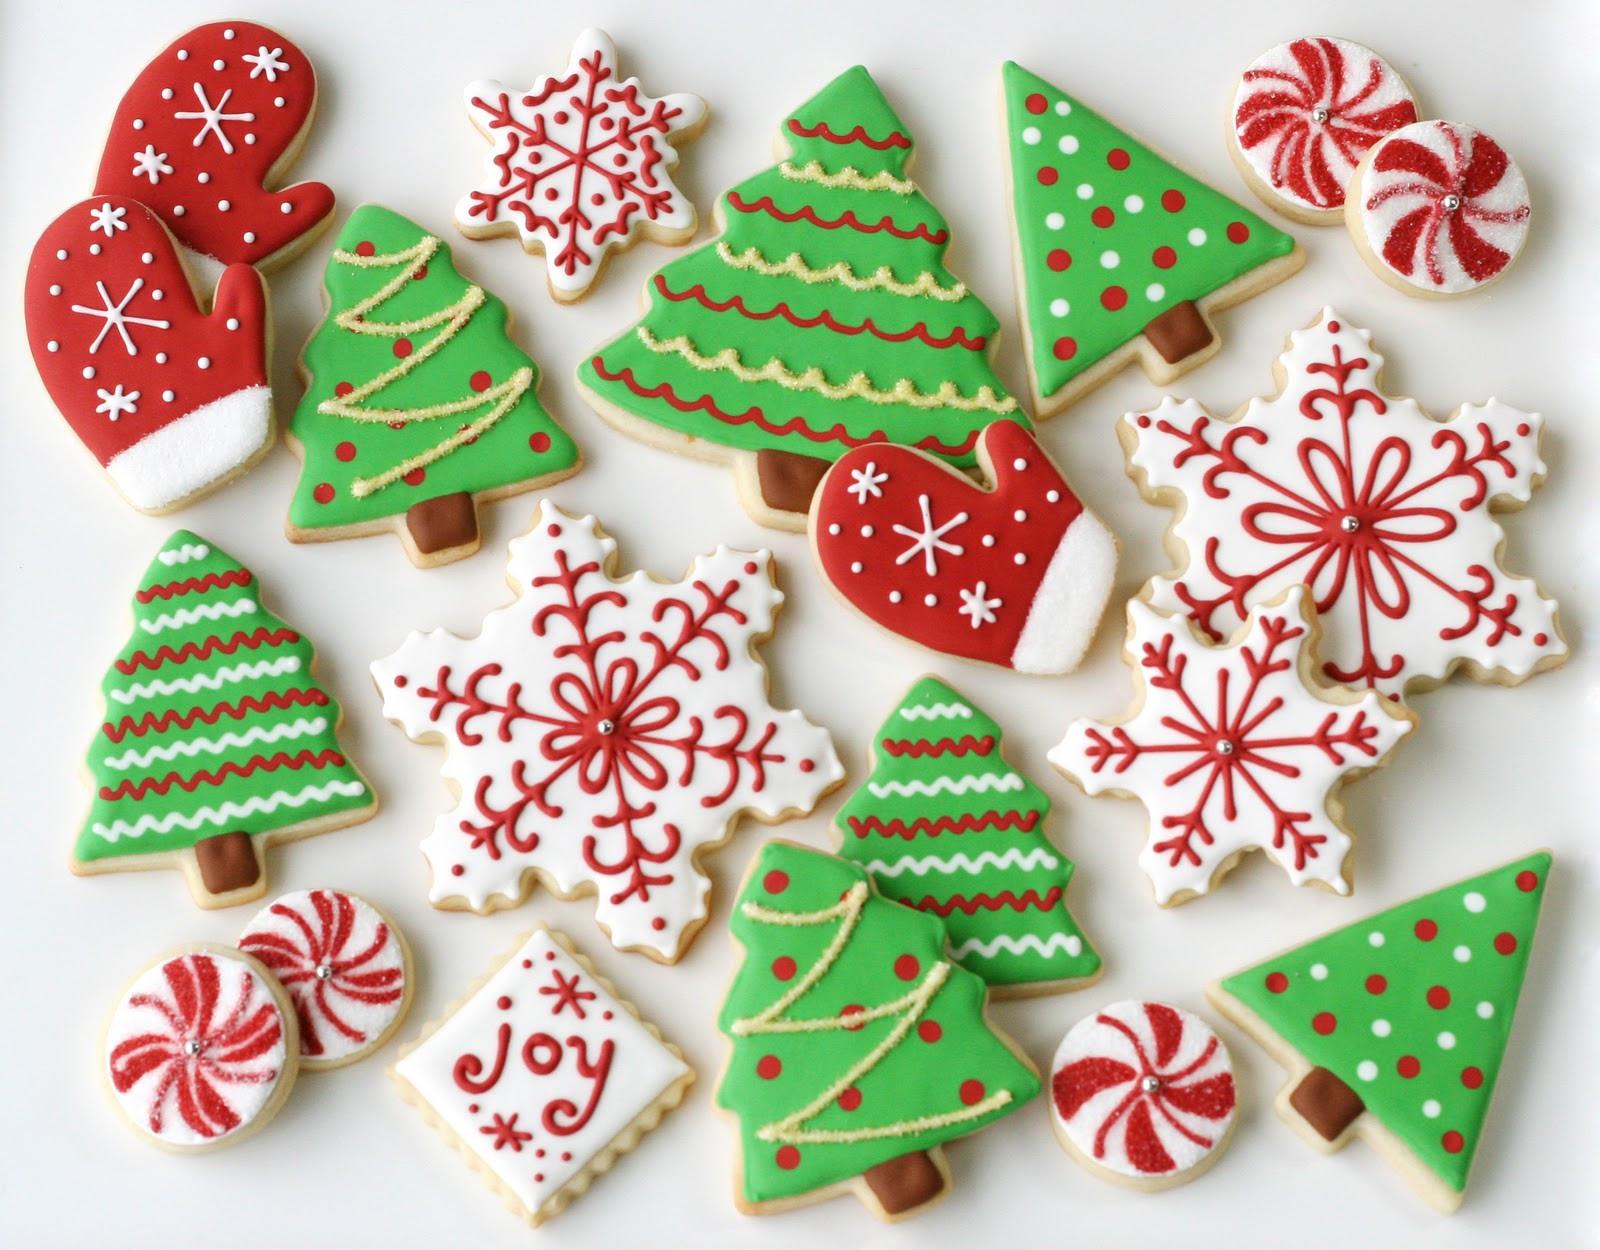 Christmas Cookies Image  Christmas Cookies Galore Glorious Treats